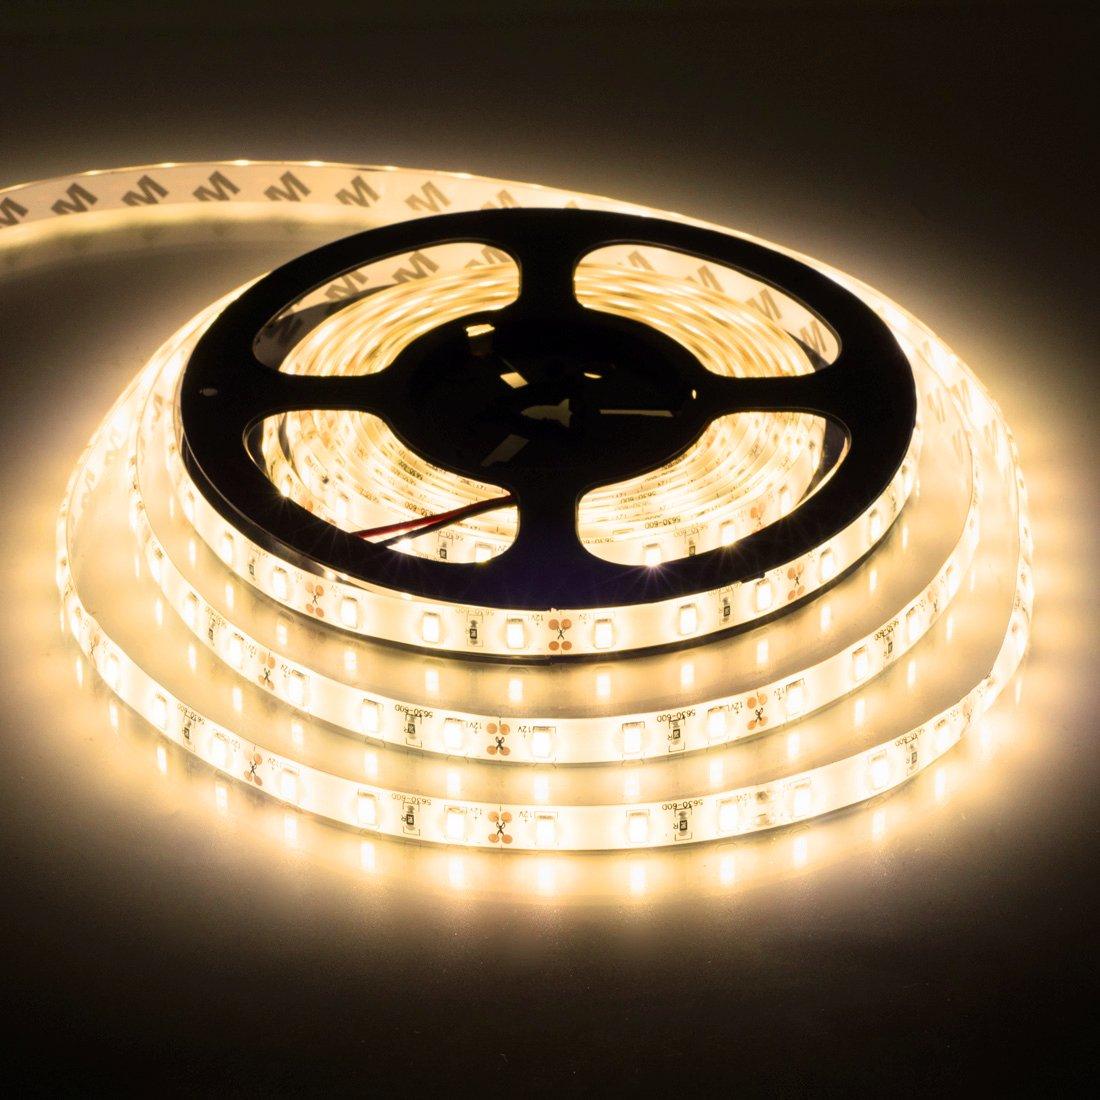 BTF-LIGHTING 16.4ft Warm White SMD5630 Led Strip Light 300LEDs DC12V Waterproof IP65 25Lm/LED, 2 times brightness than SMD5050 LED Ribbon Light, 5631 LED Tape